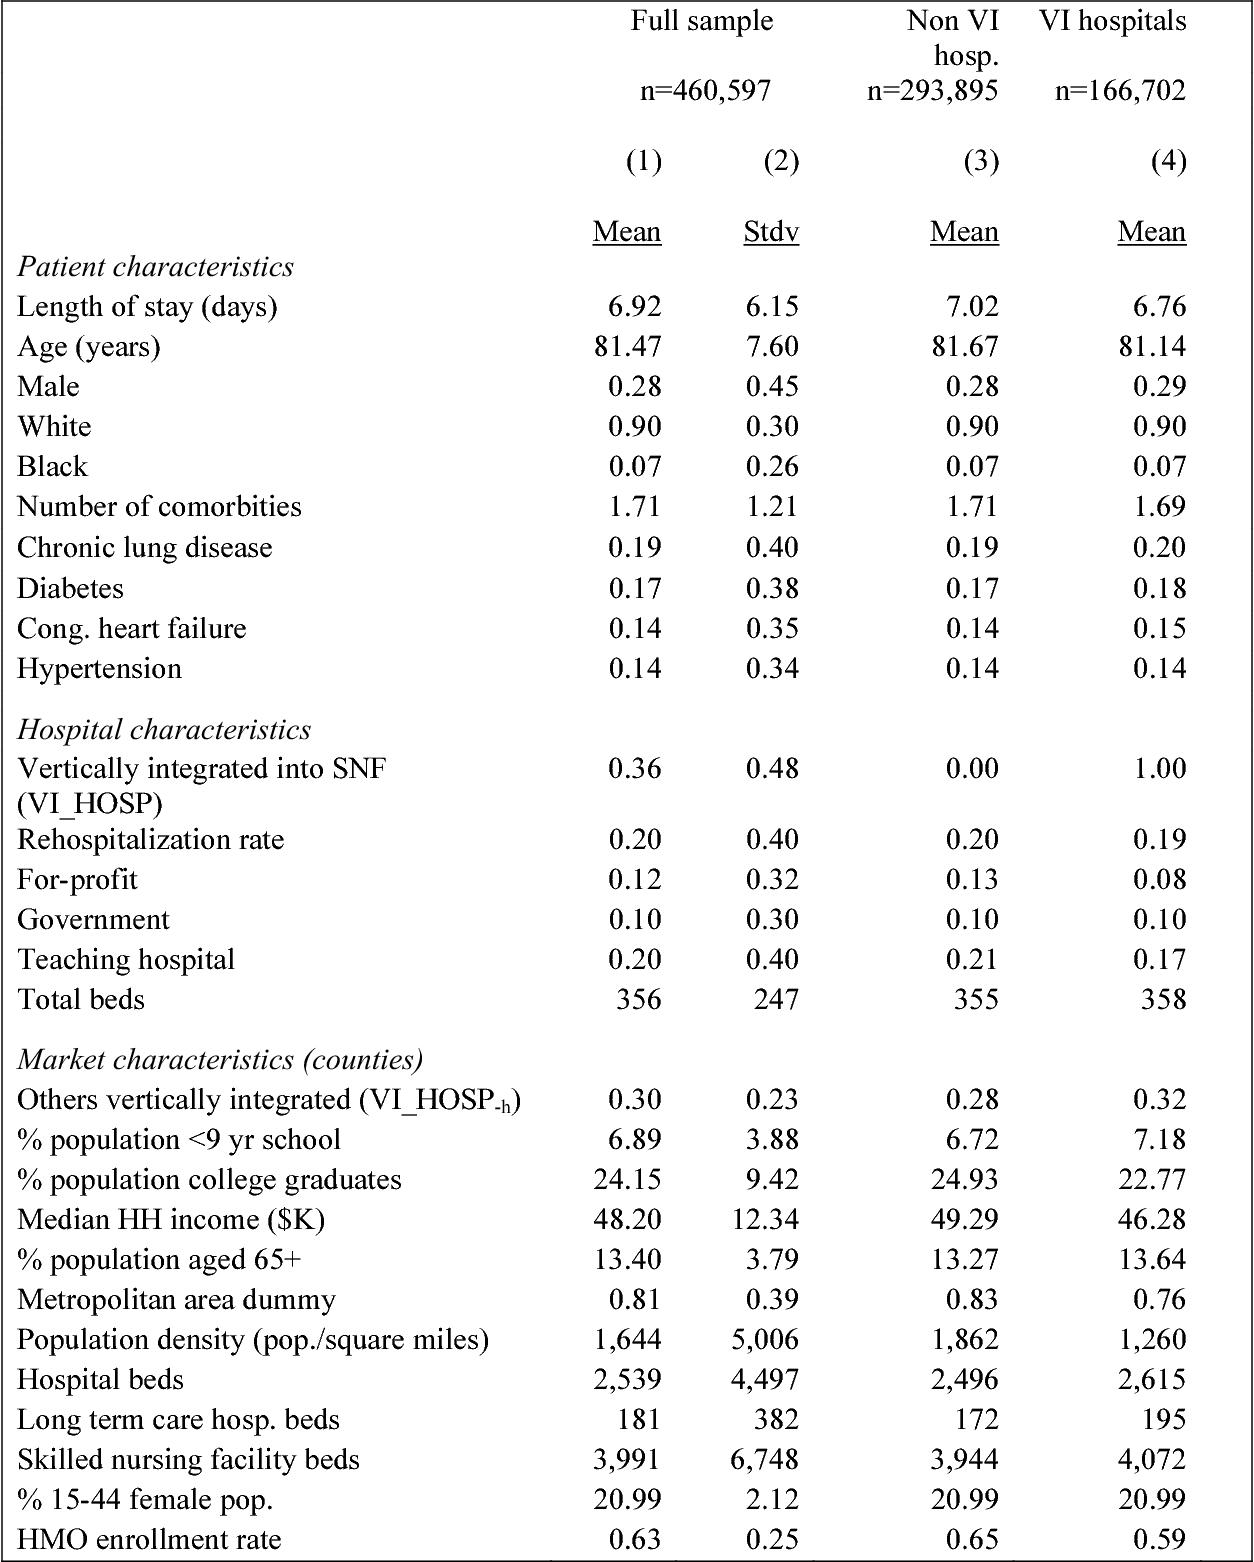 Table I-B Descriptive statistics for key variables: skilled nursing facility